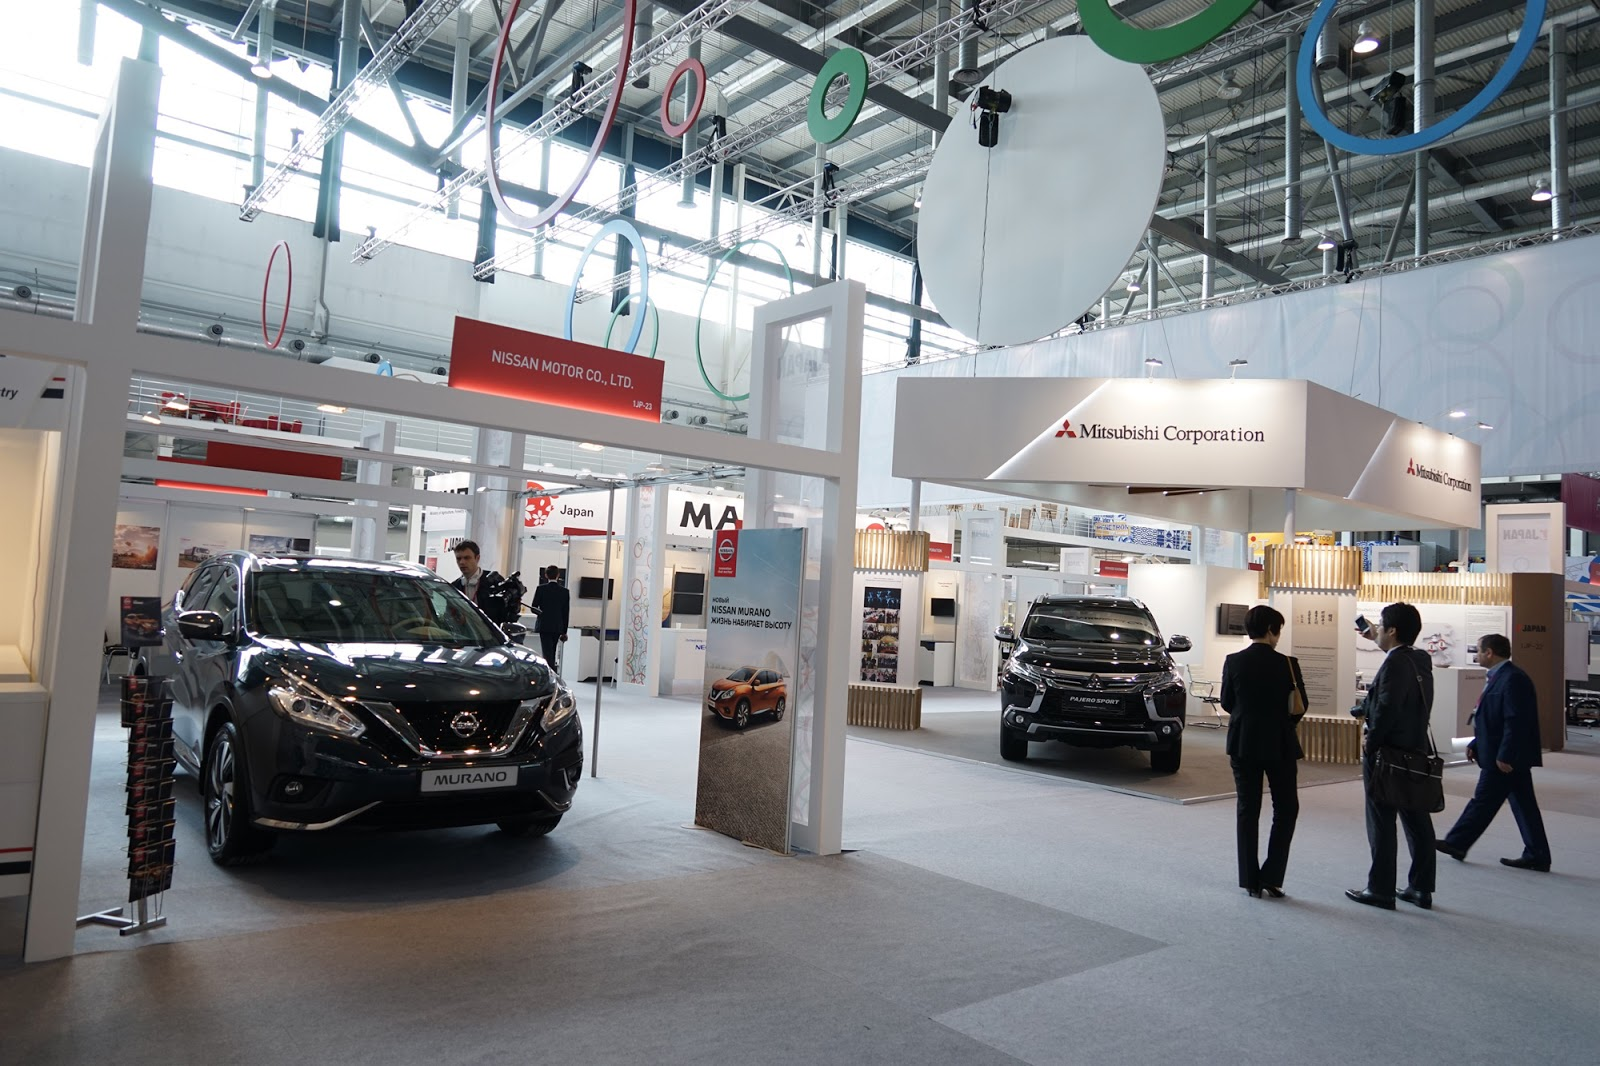 To αναπτυξιακό πλάνο της Nissan για το εργοστάσιο της Αγίας Πετρούπολης στη Ρωσία